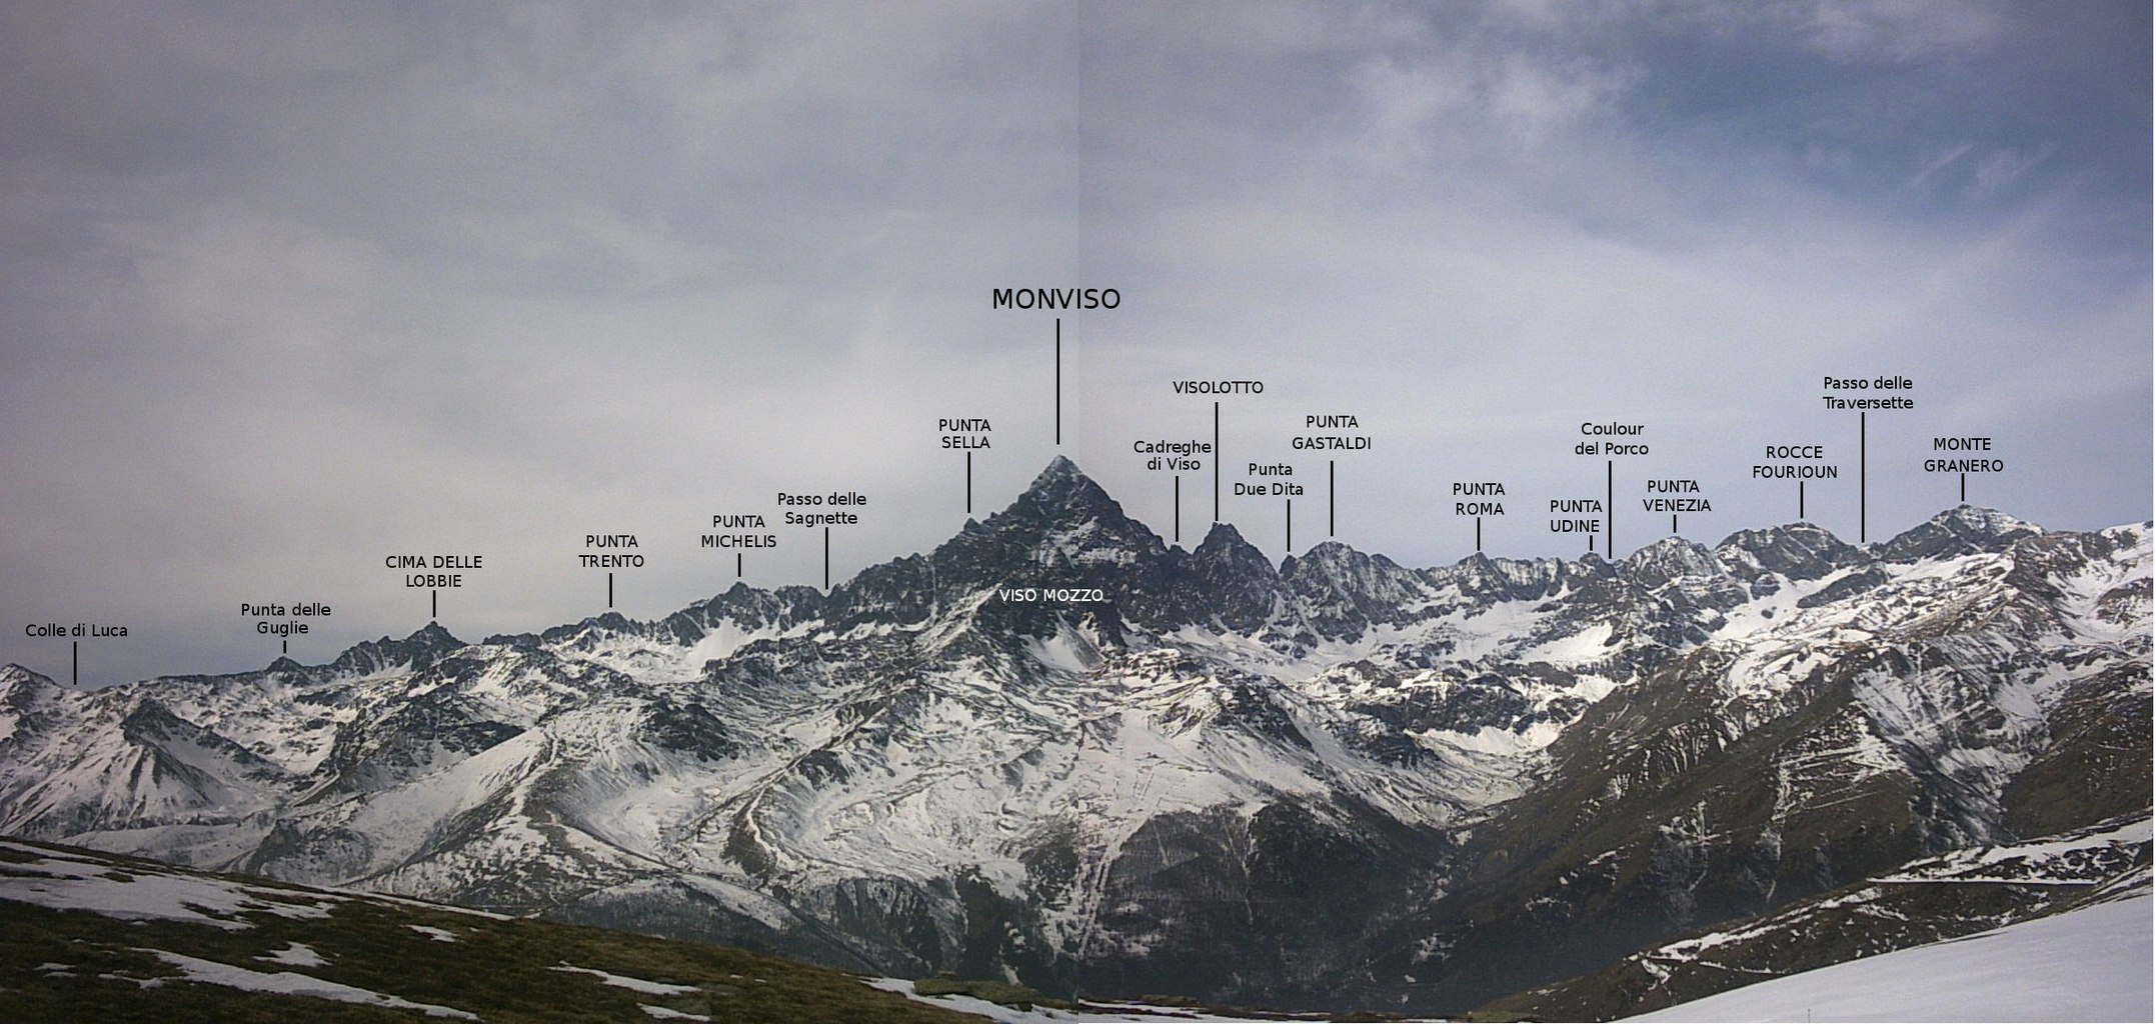 [Image: 2156px-Monviso_-_panoramica_cresta_da_Ostanetta.jpg]